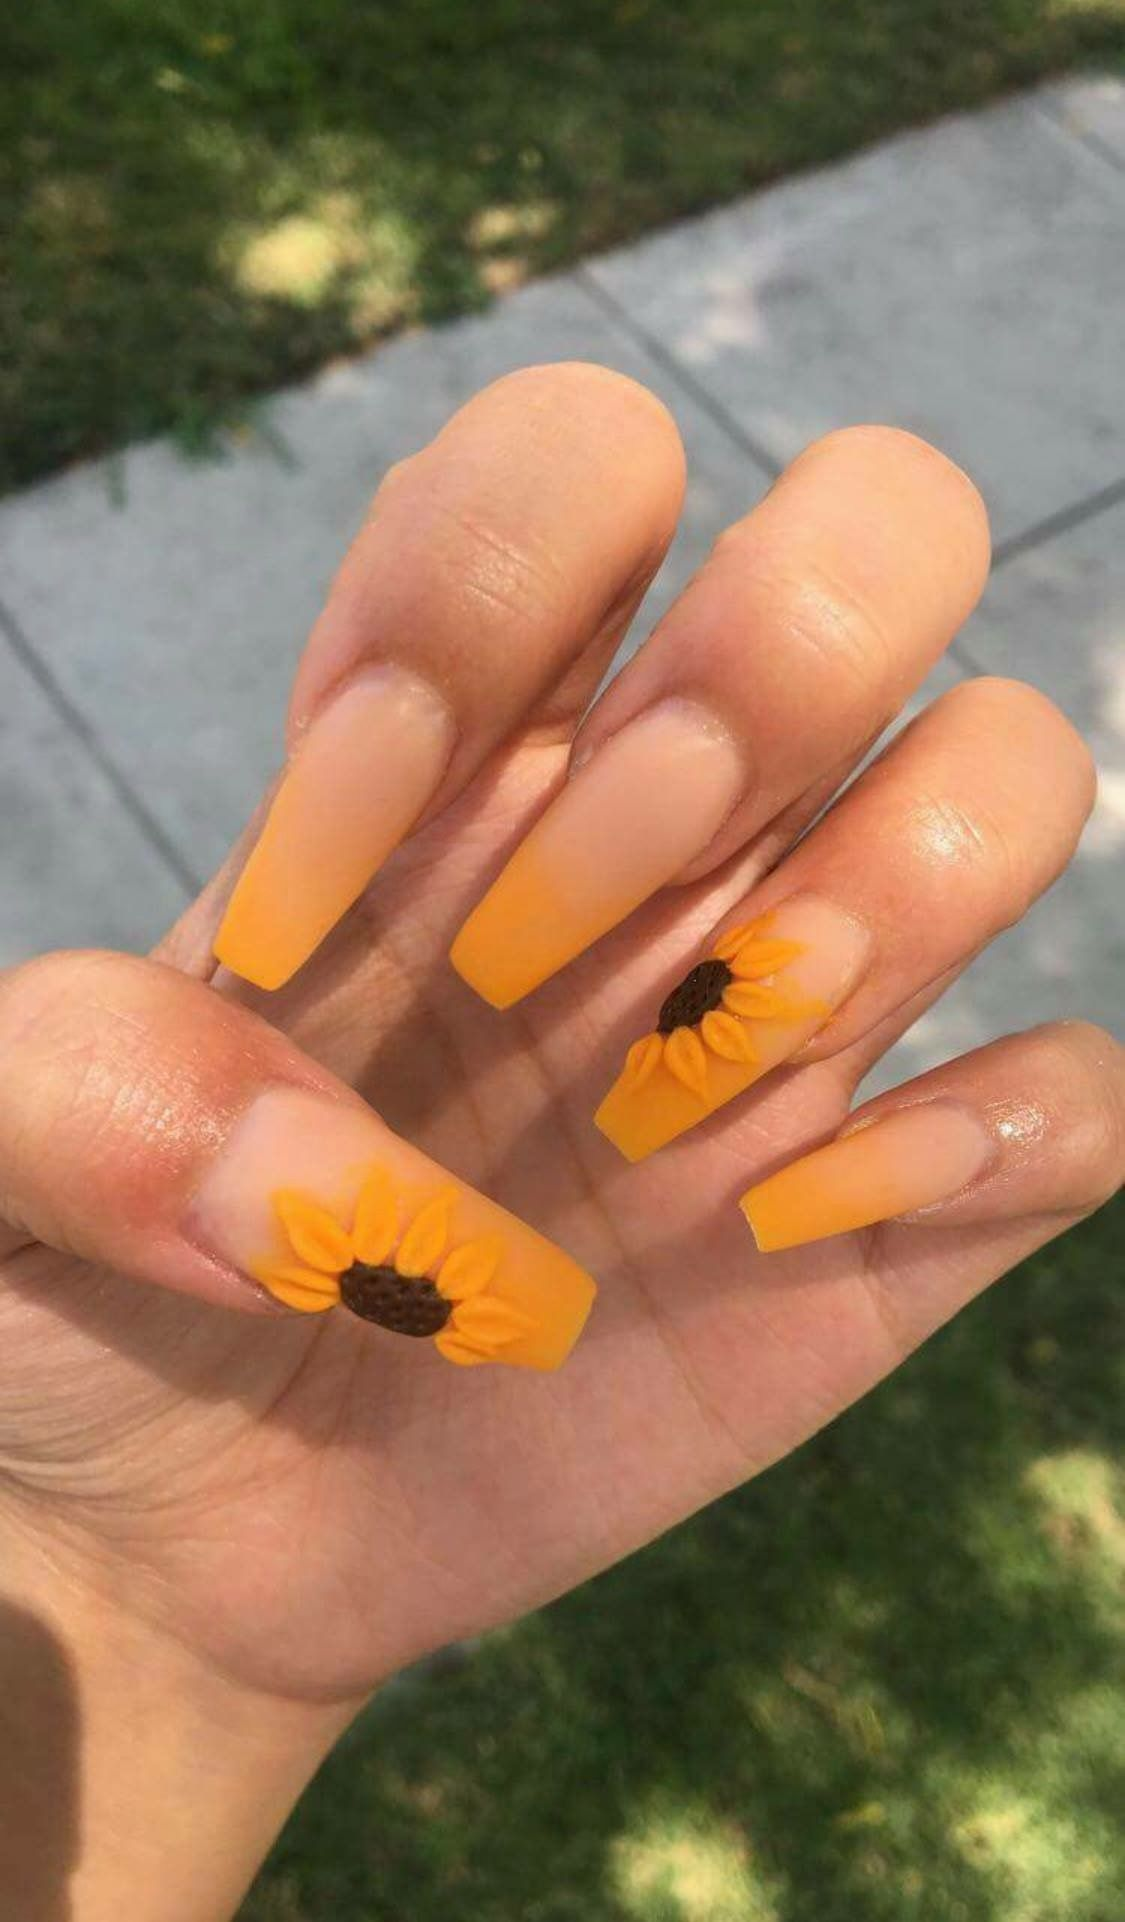 Sunflower Coffin Nails Coffin Nails Designs Sunflower Nails